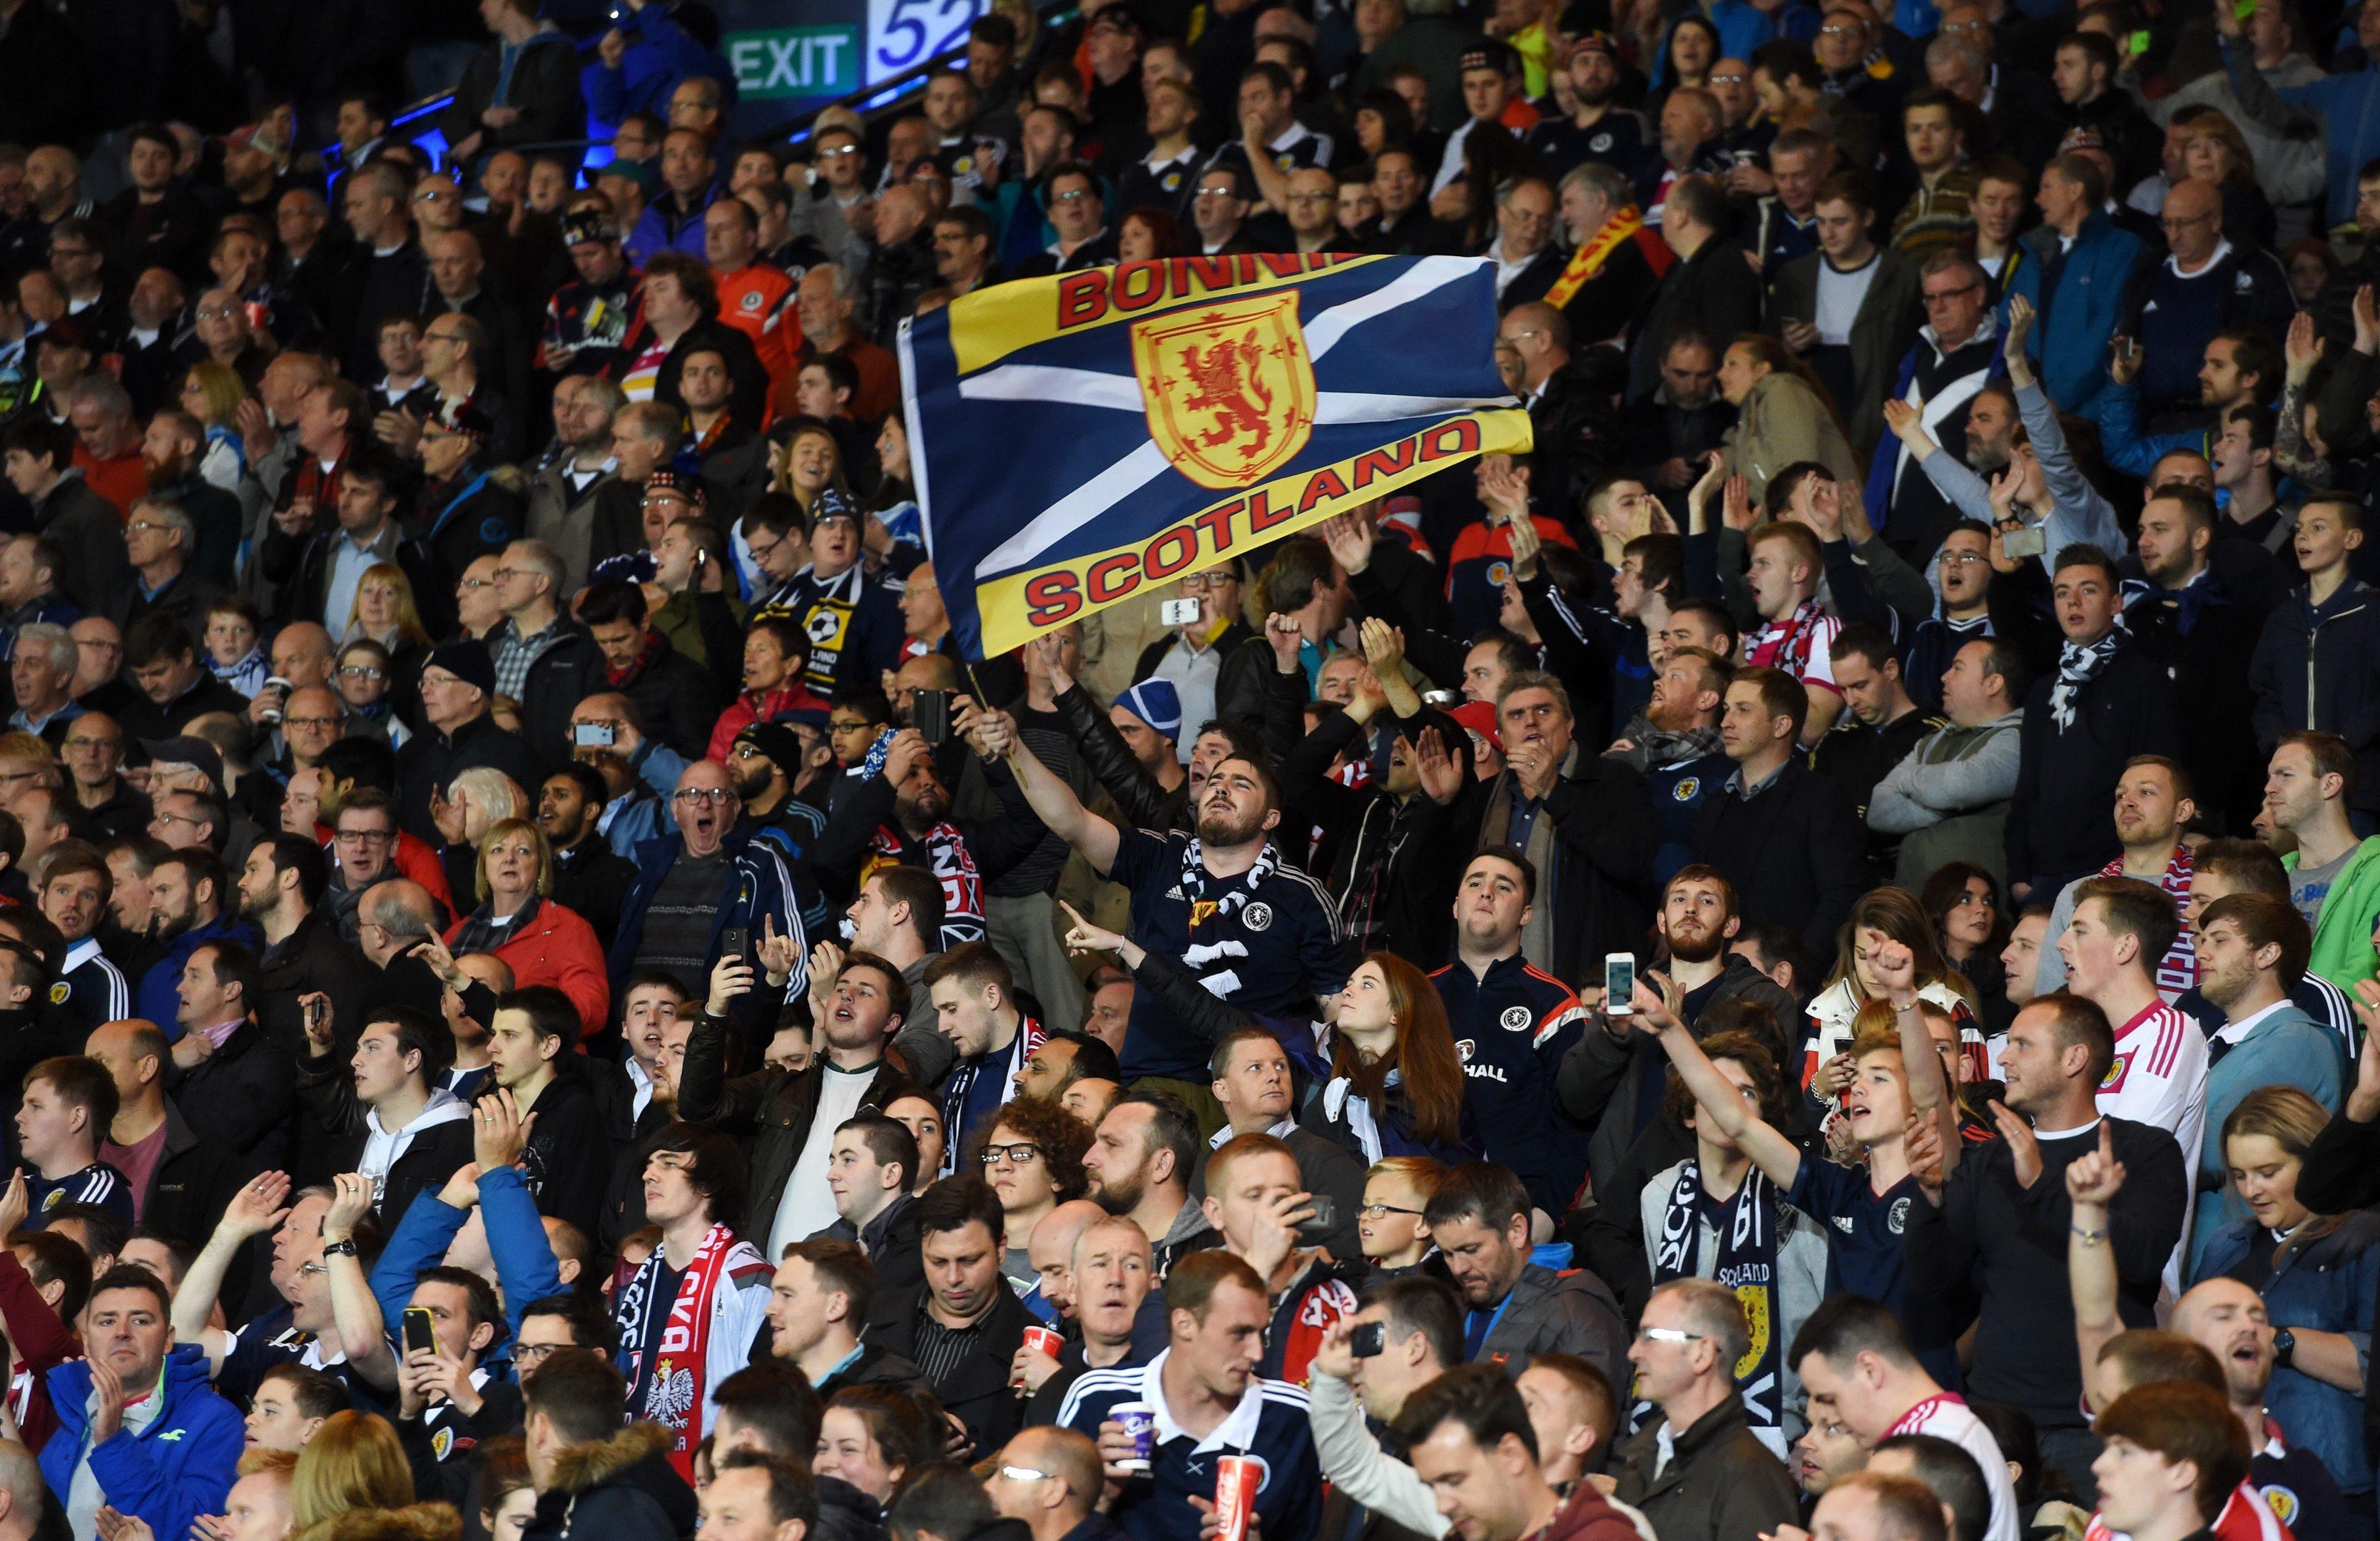 Scotland fans: should look at bigger picture.